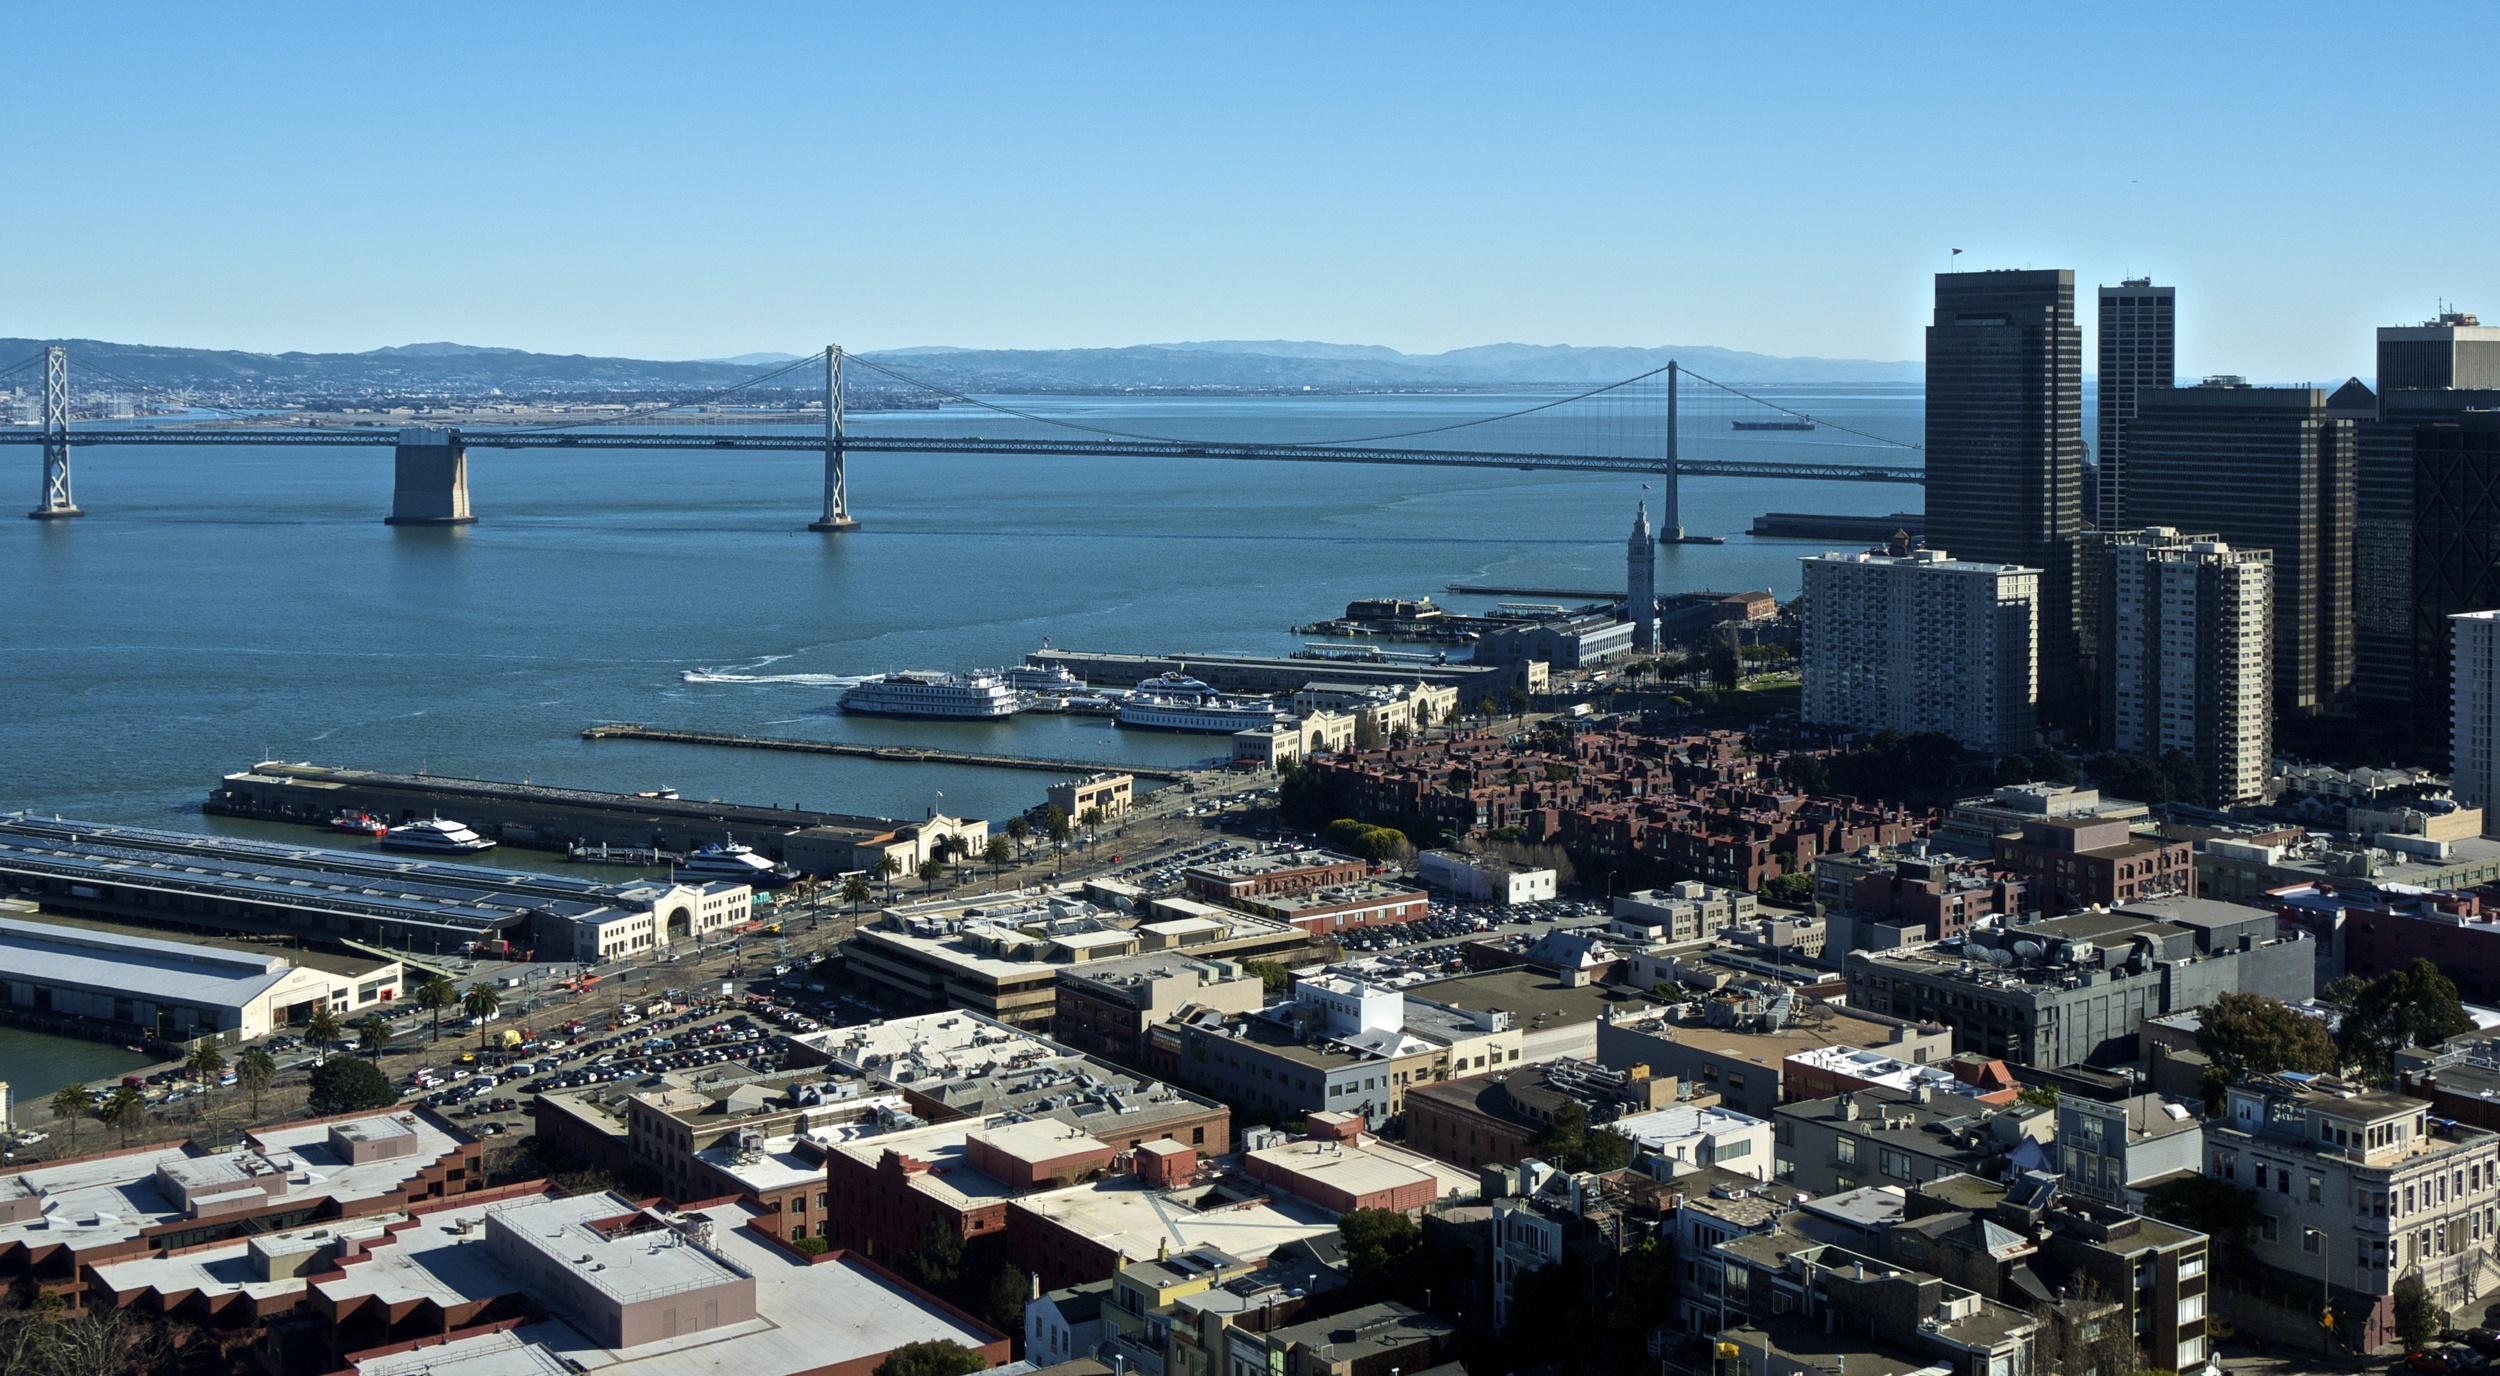 San Francisco Bay Bridge seen from Coit Tower